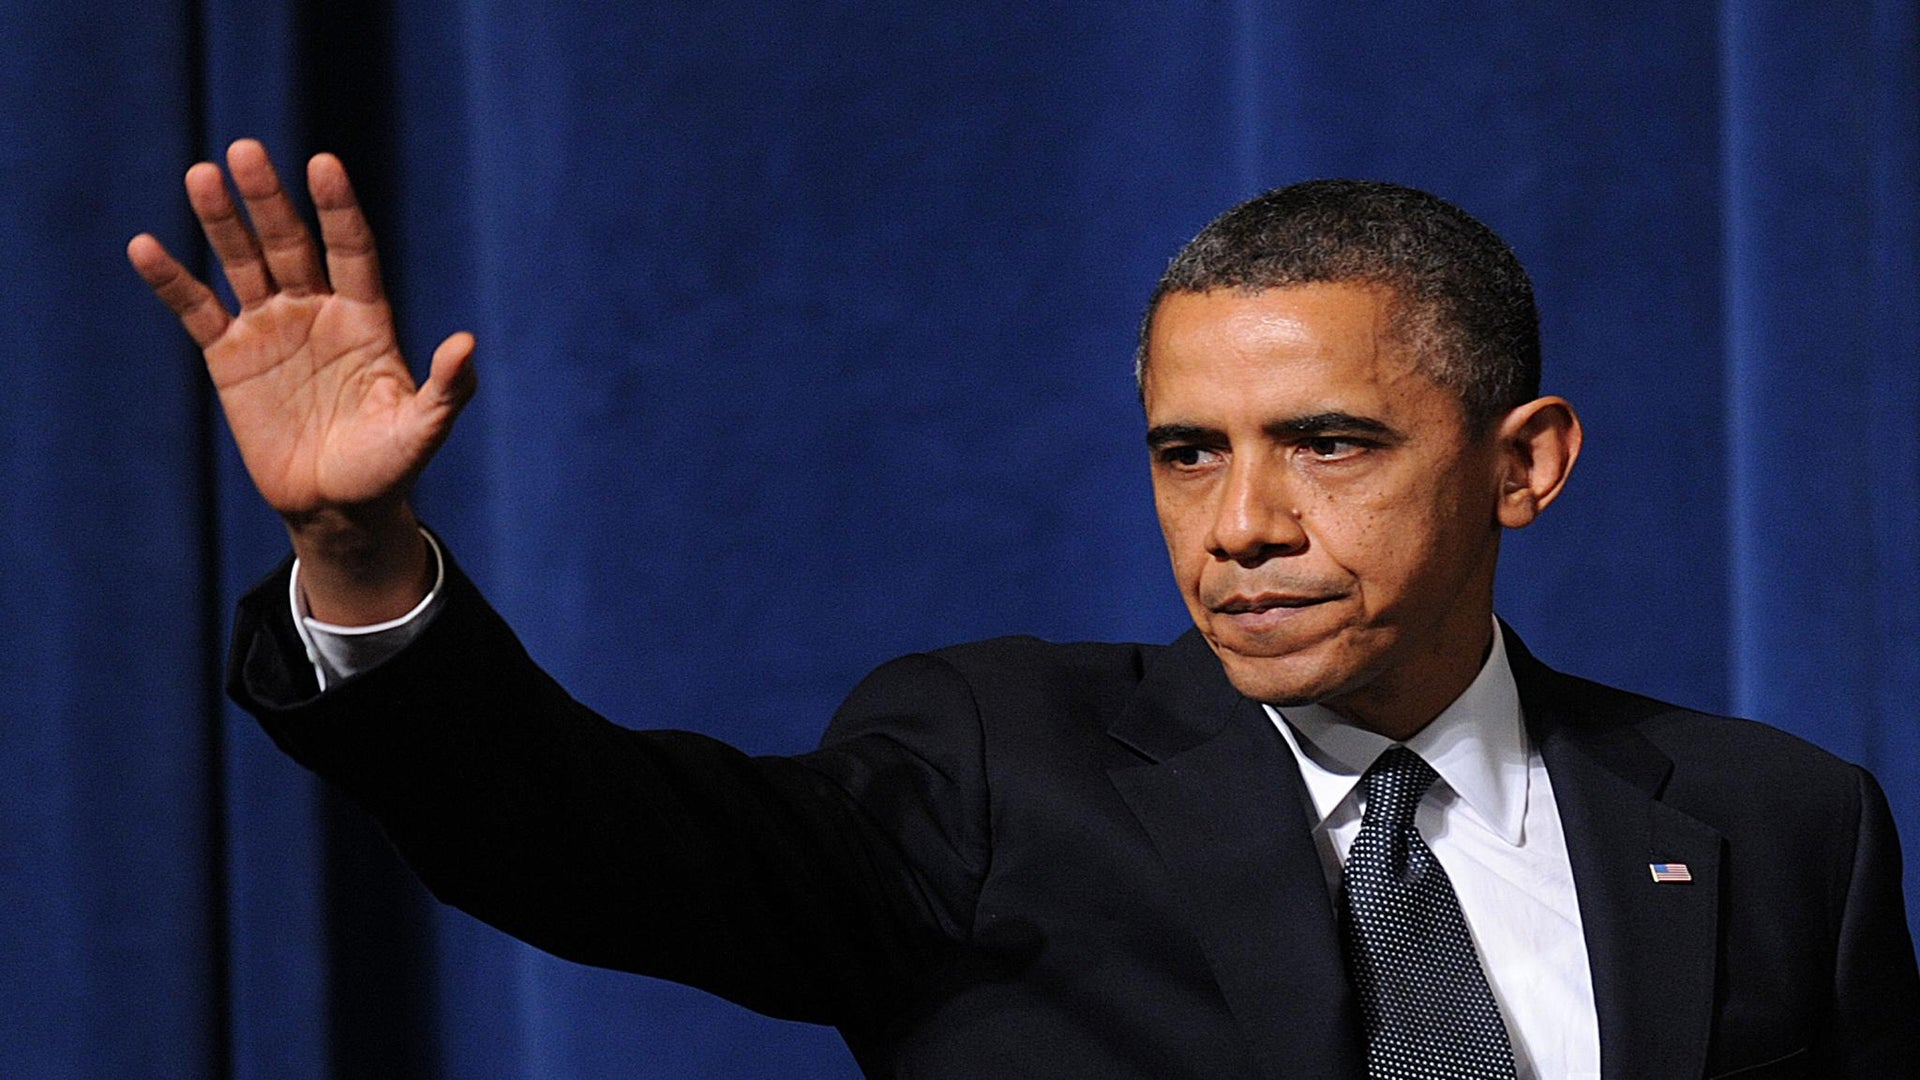 Obama Names Newtown Shootings Worst Day of Presidency